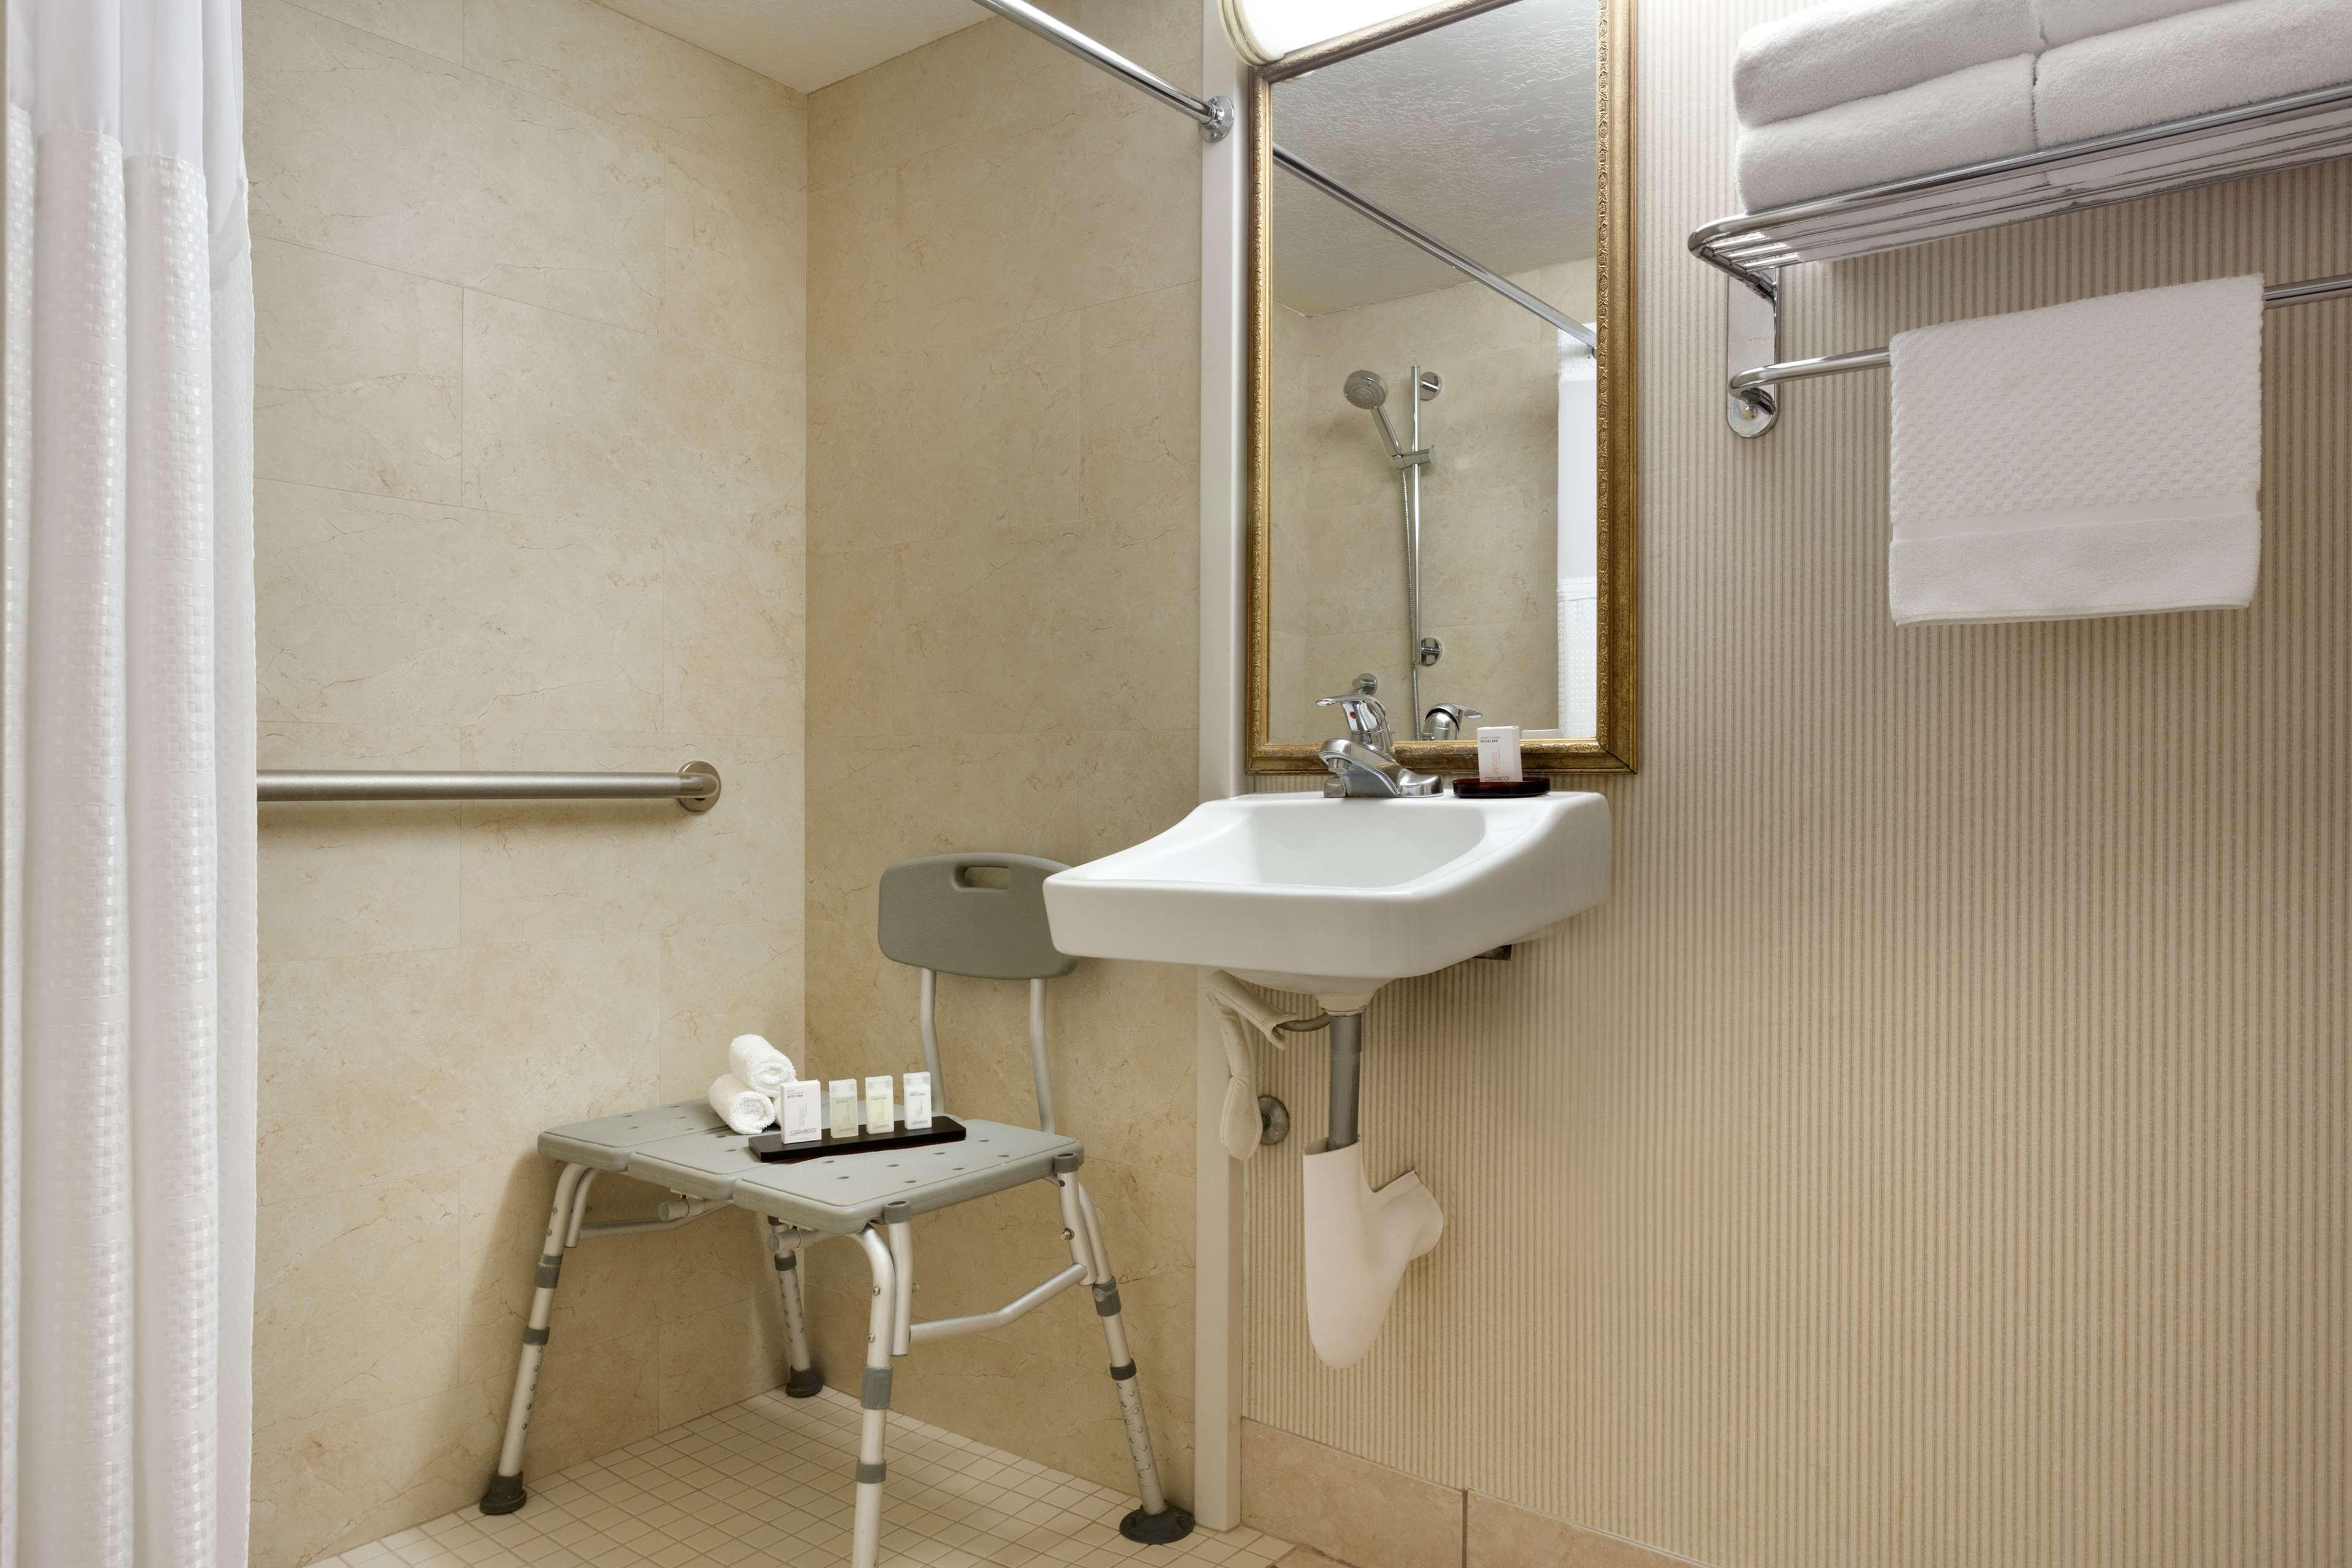 Embassy Suites by Hilton Arcadia Pasadena Area image 31